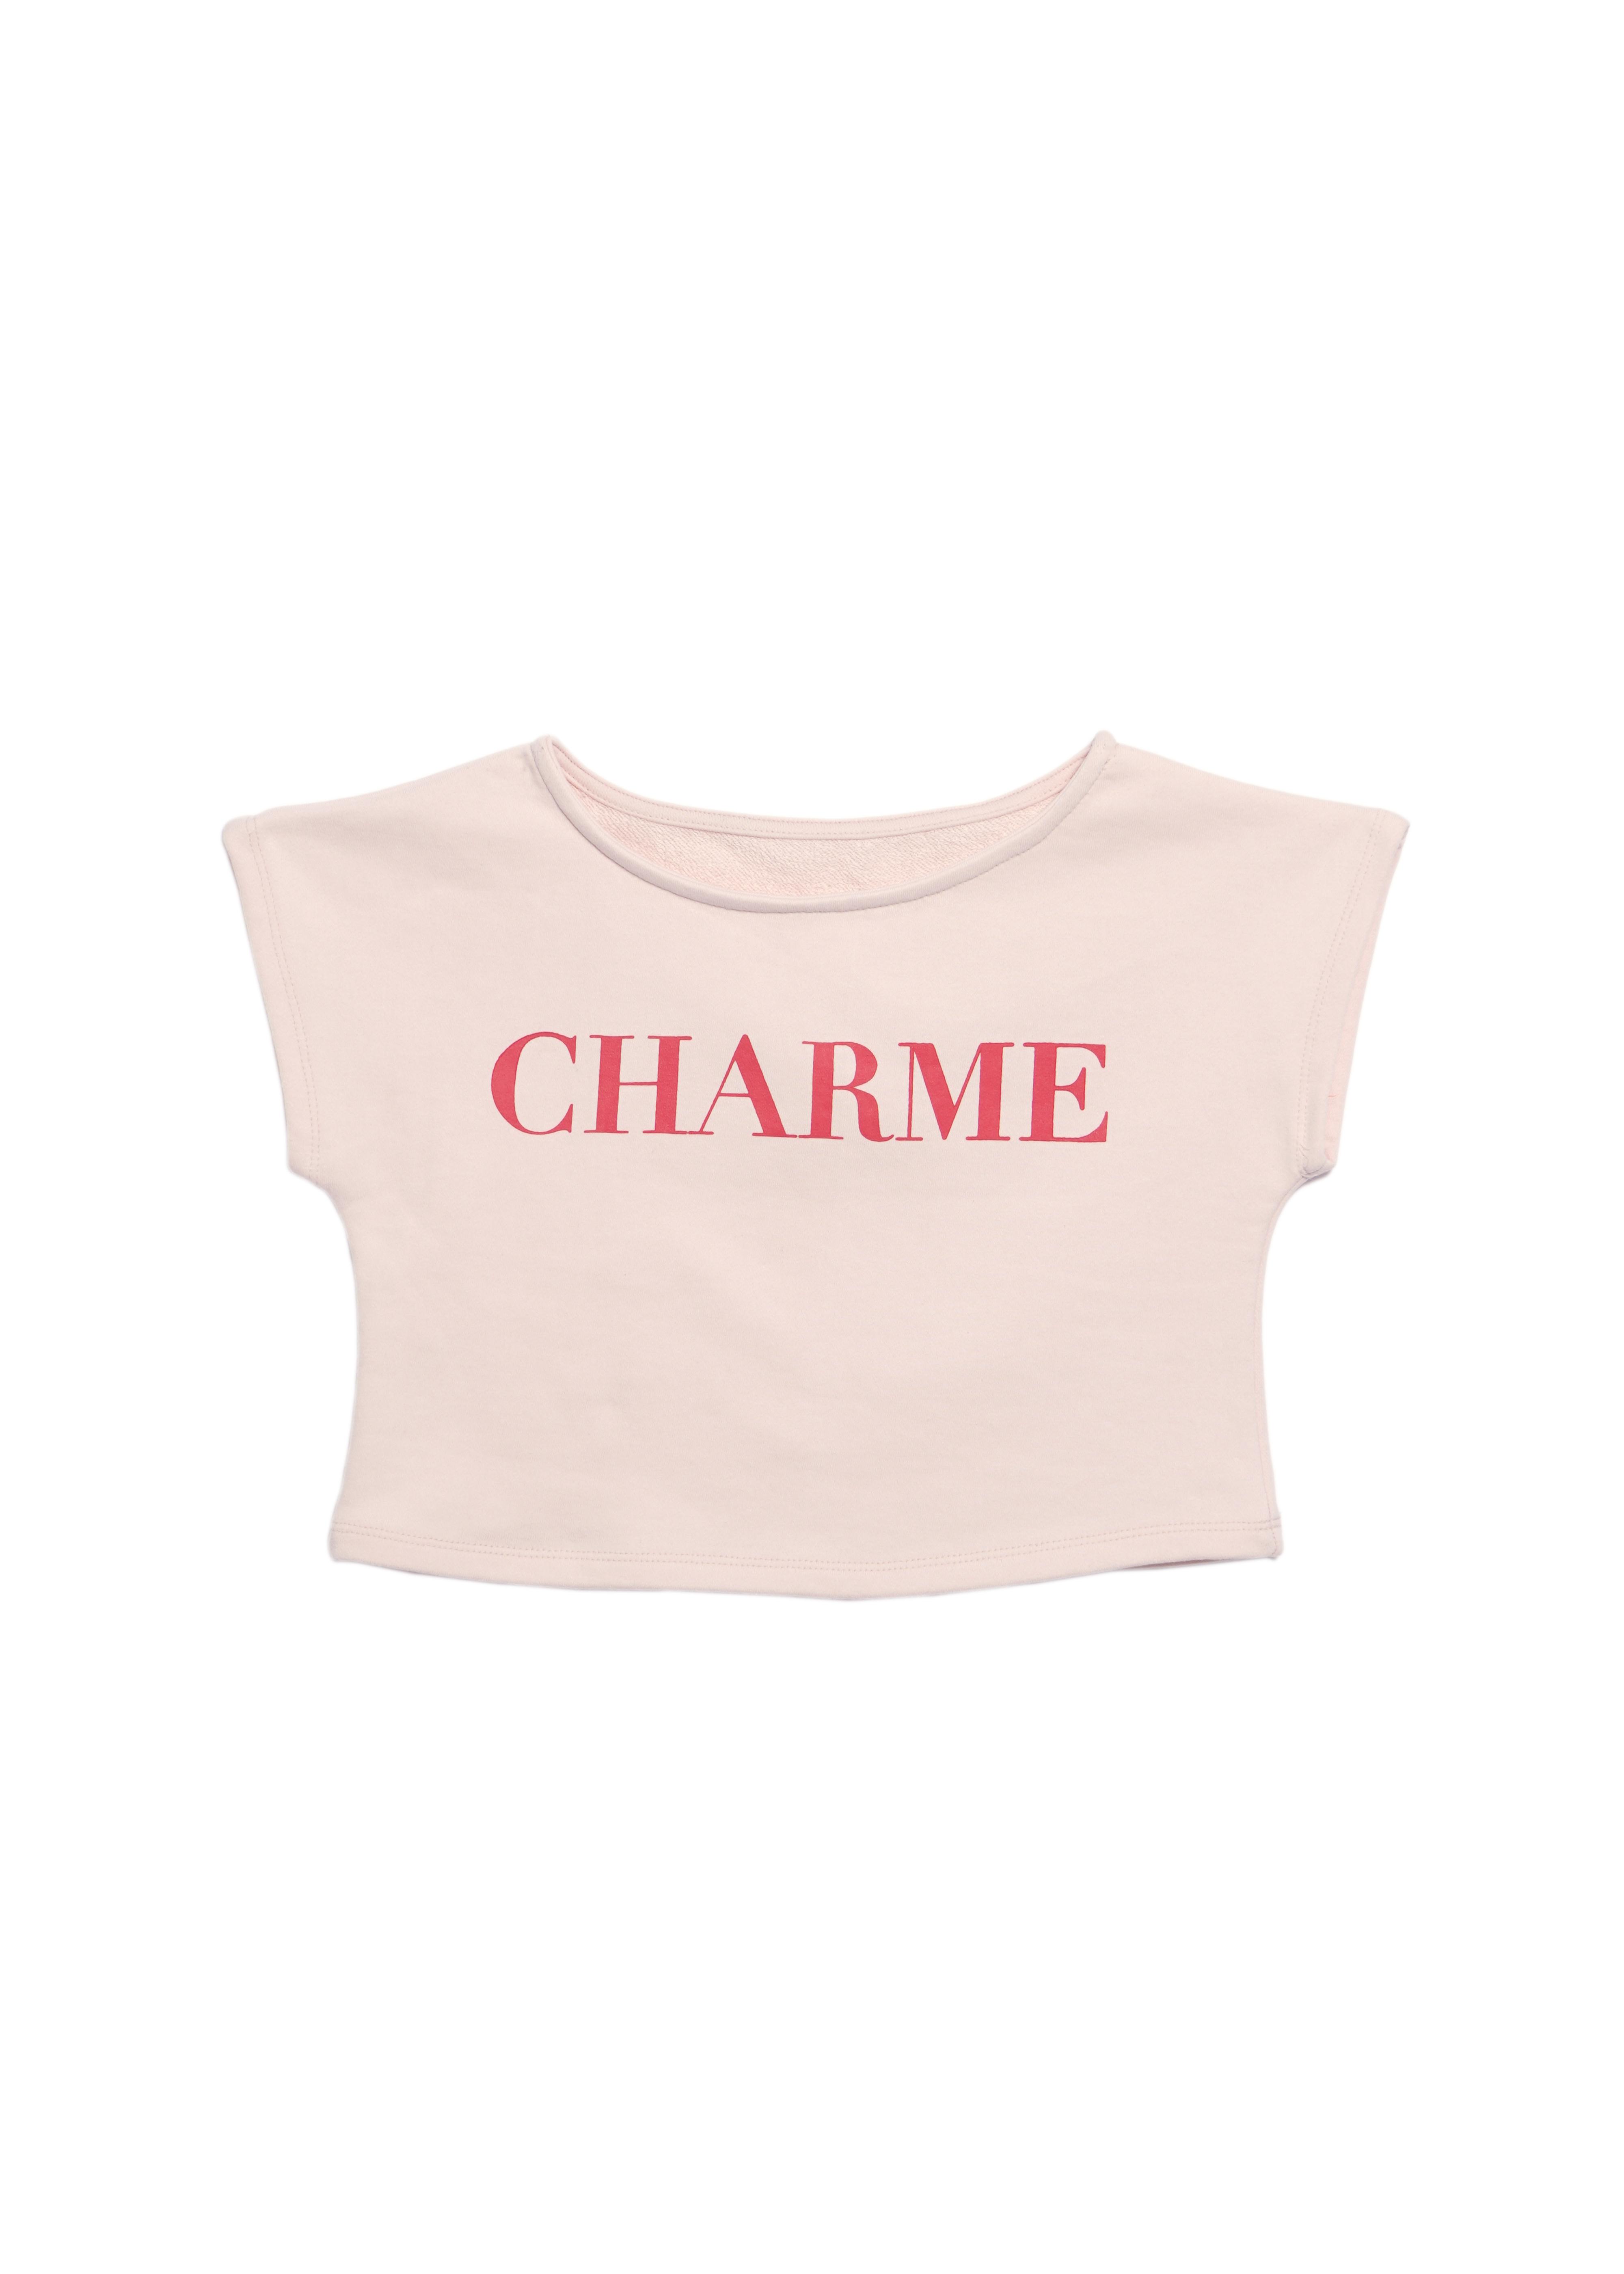 CHARME rogo short tee(pink)